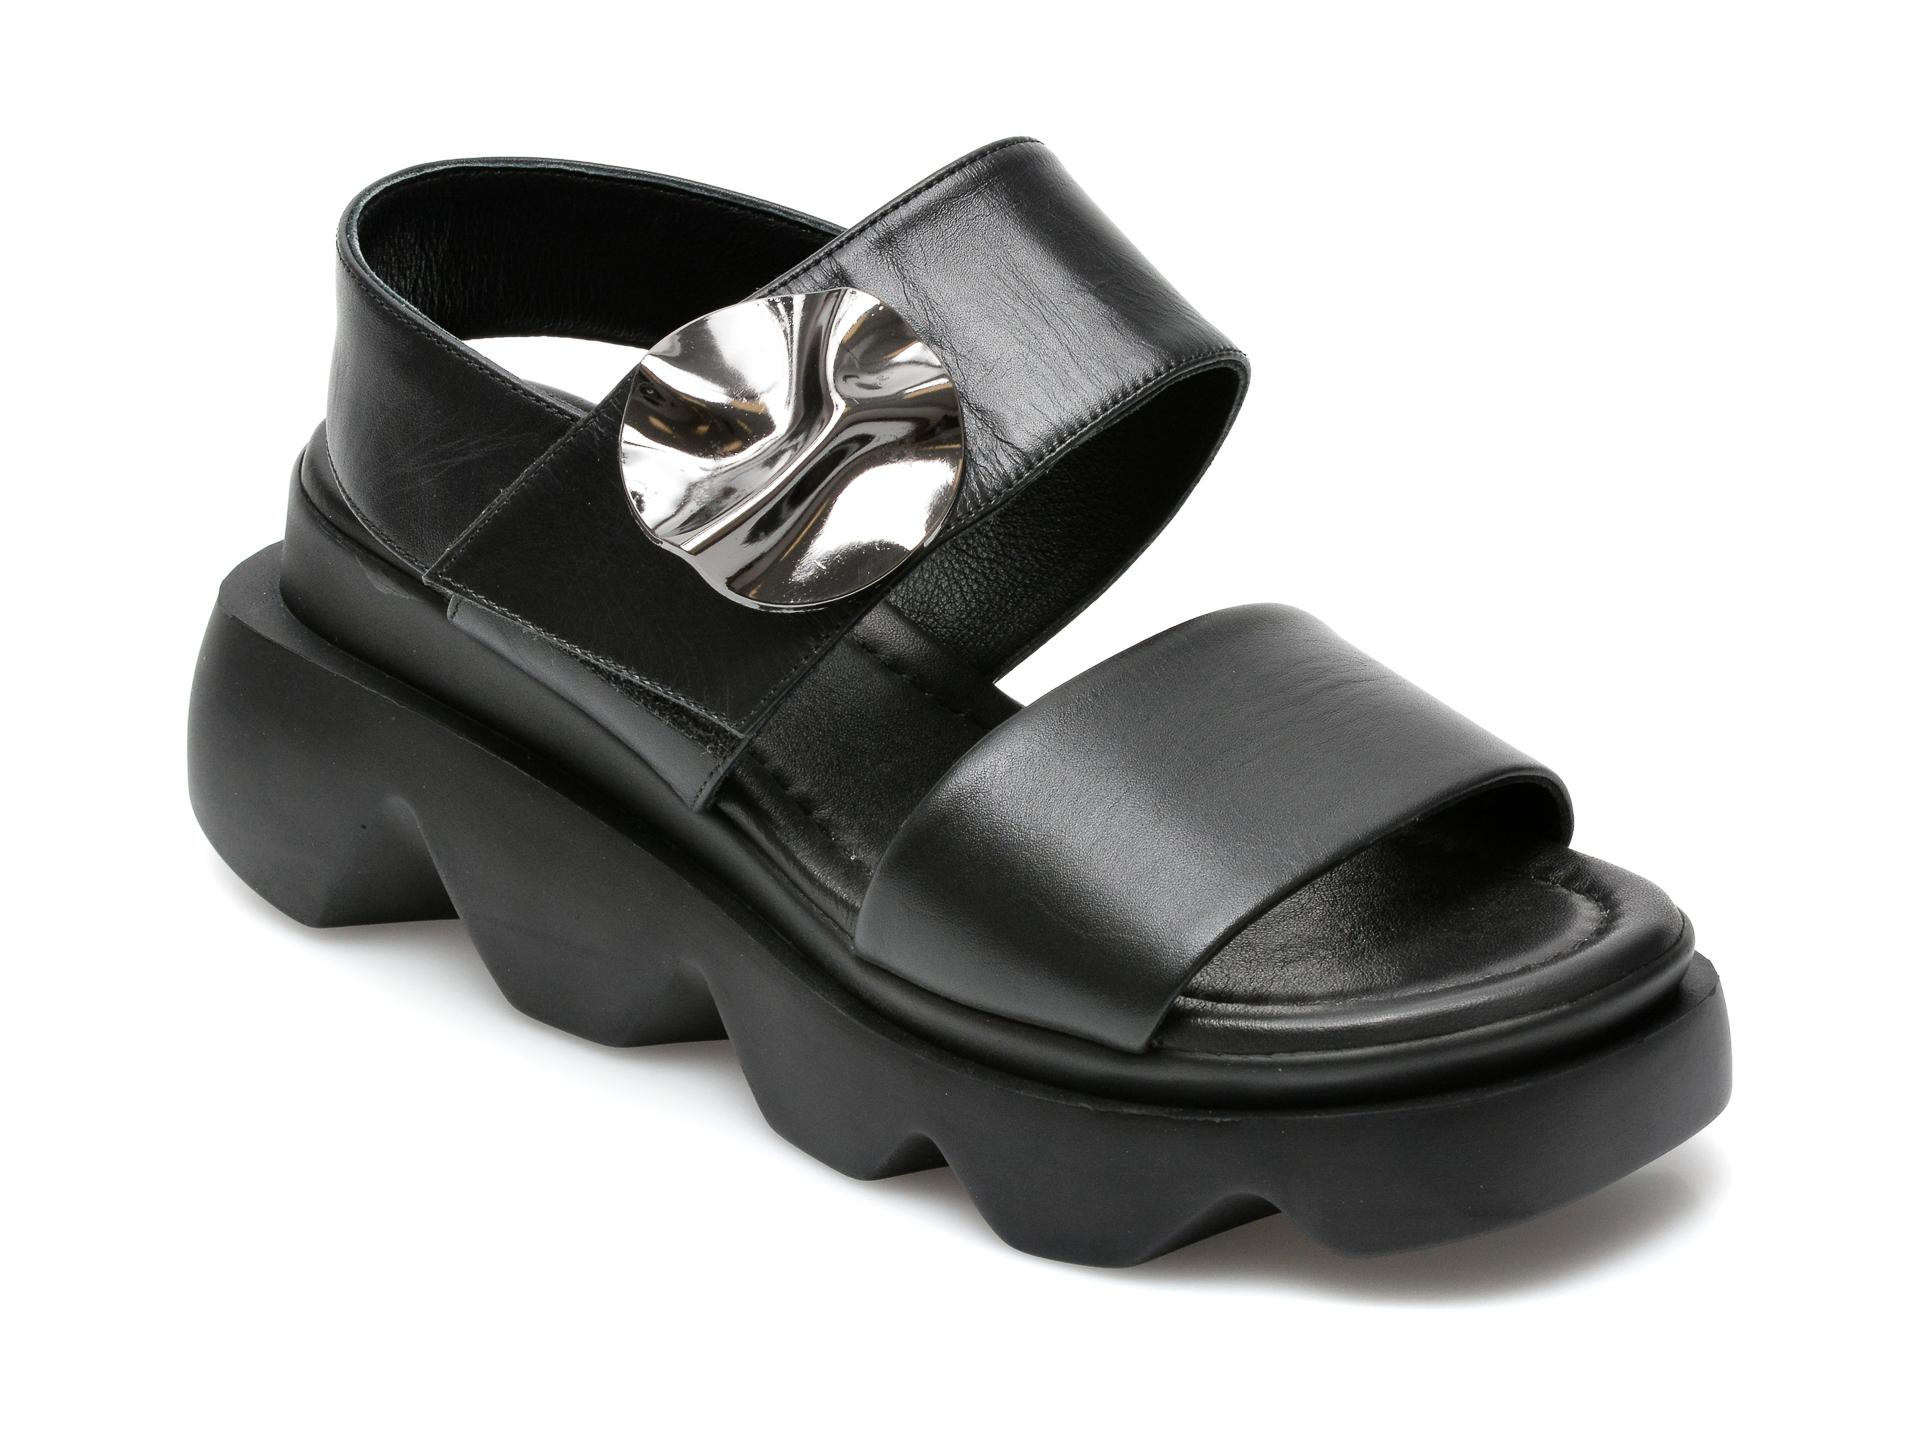 Sandale EPICA negre, 6292471, din piele naturala